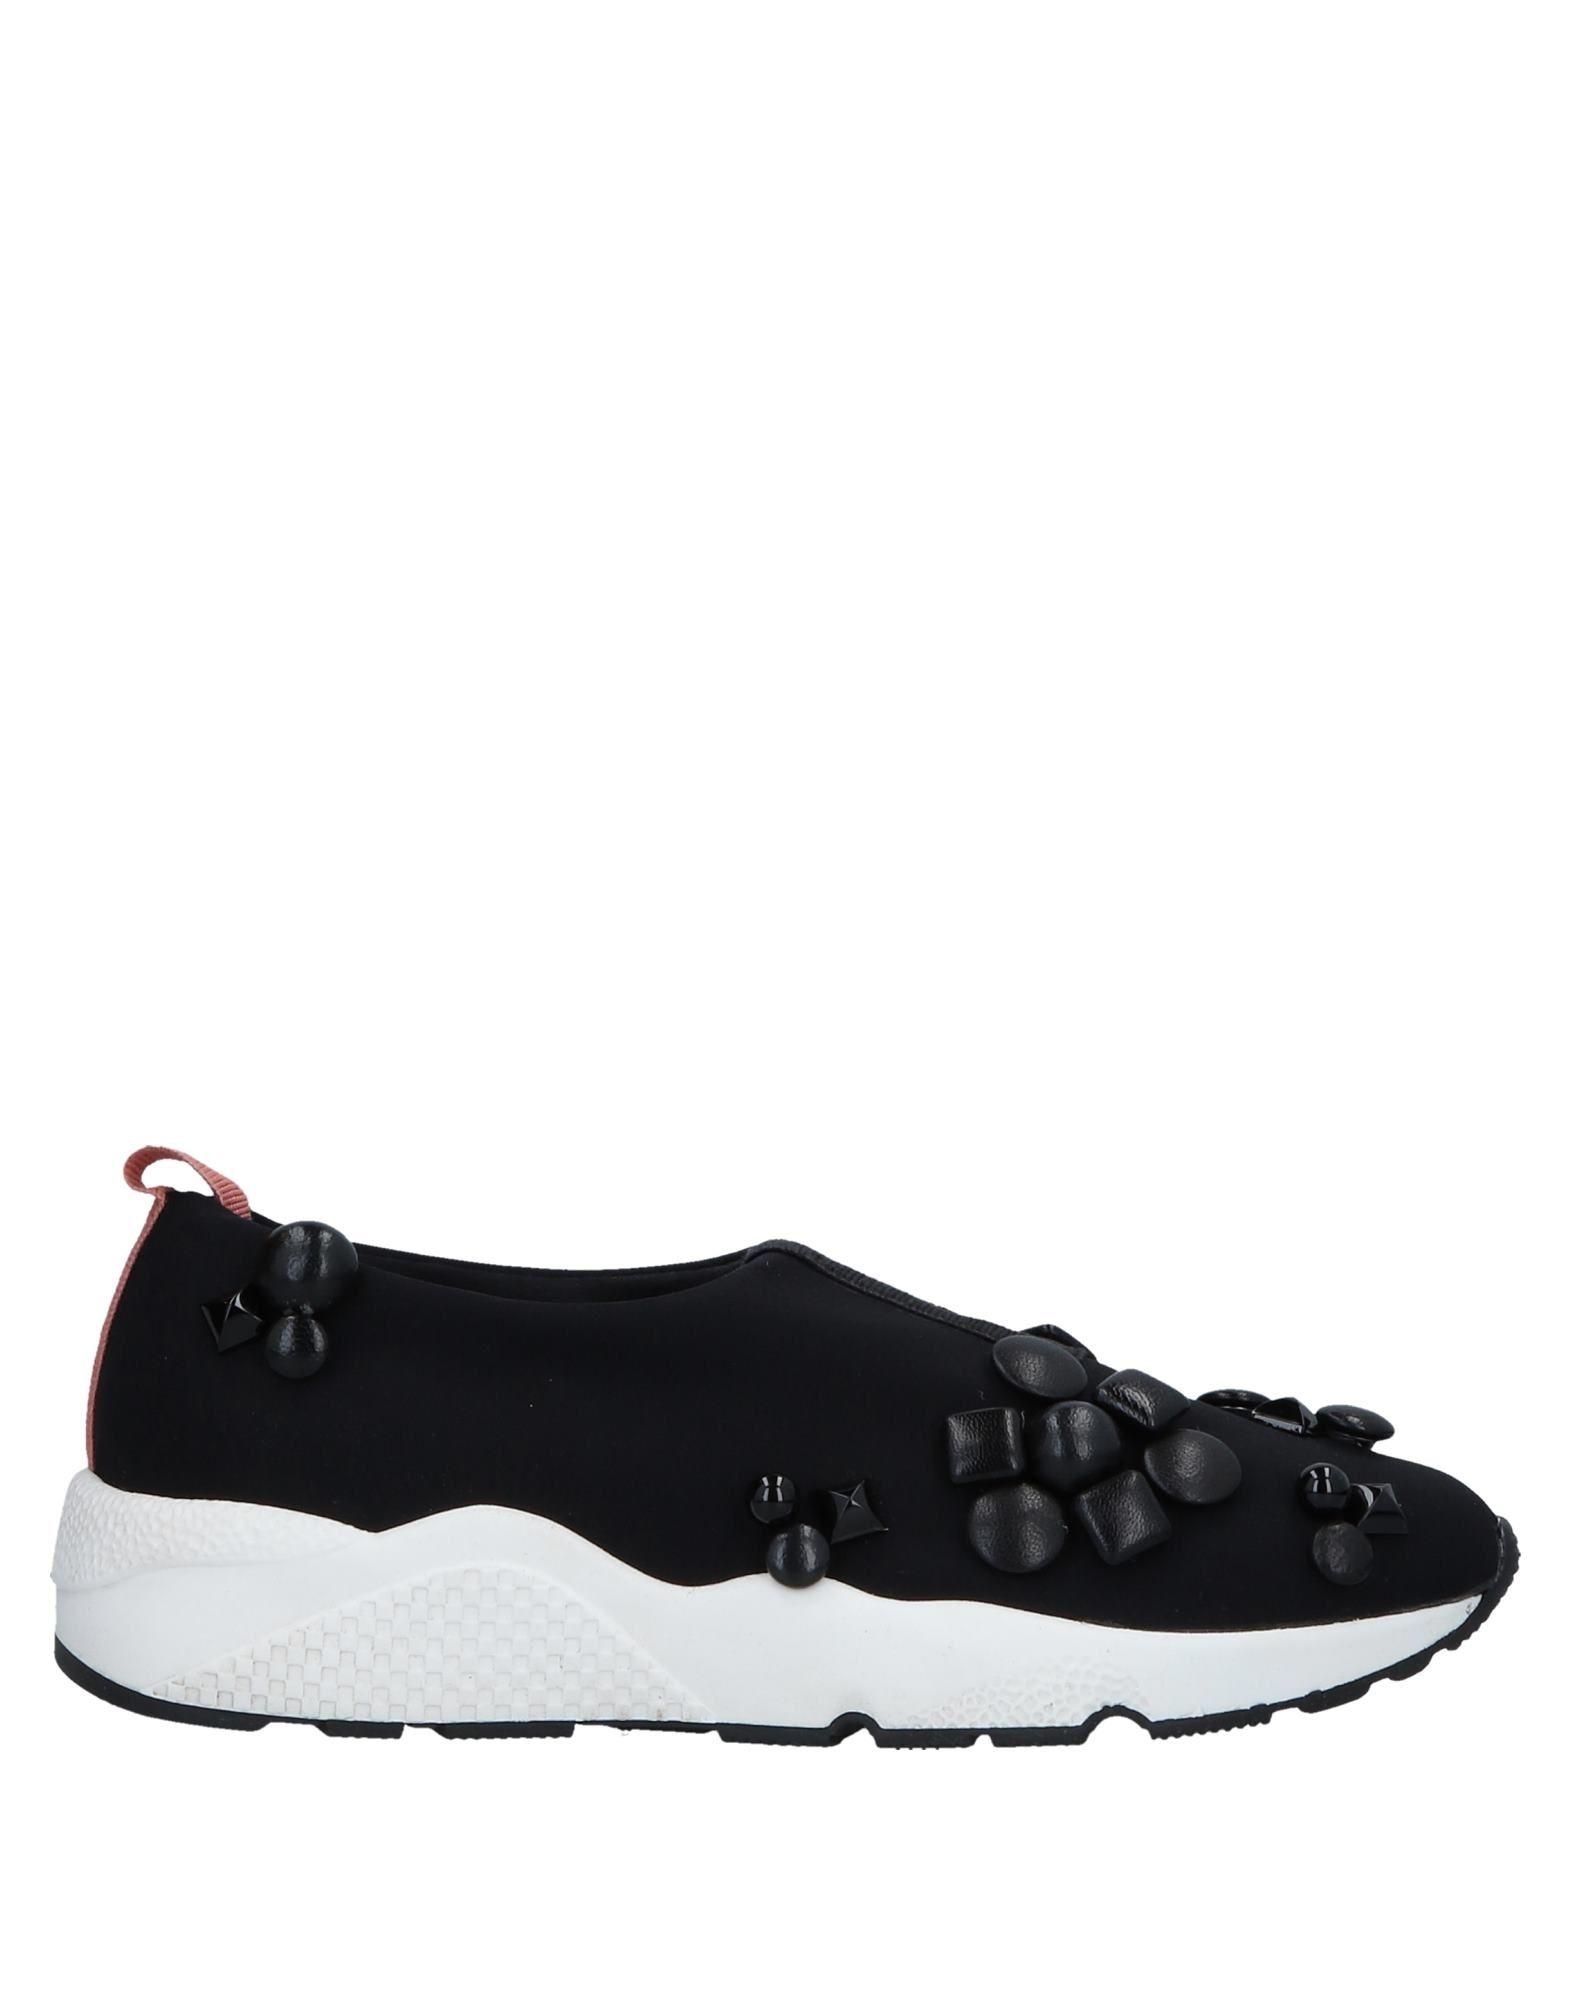 Haltbare Mode billige Schuhe Alysi Sneakers Damen  11521646RP Heiße Schuhe